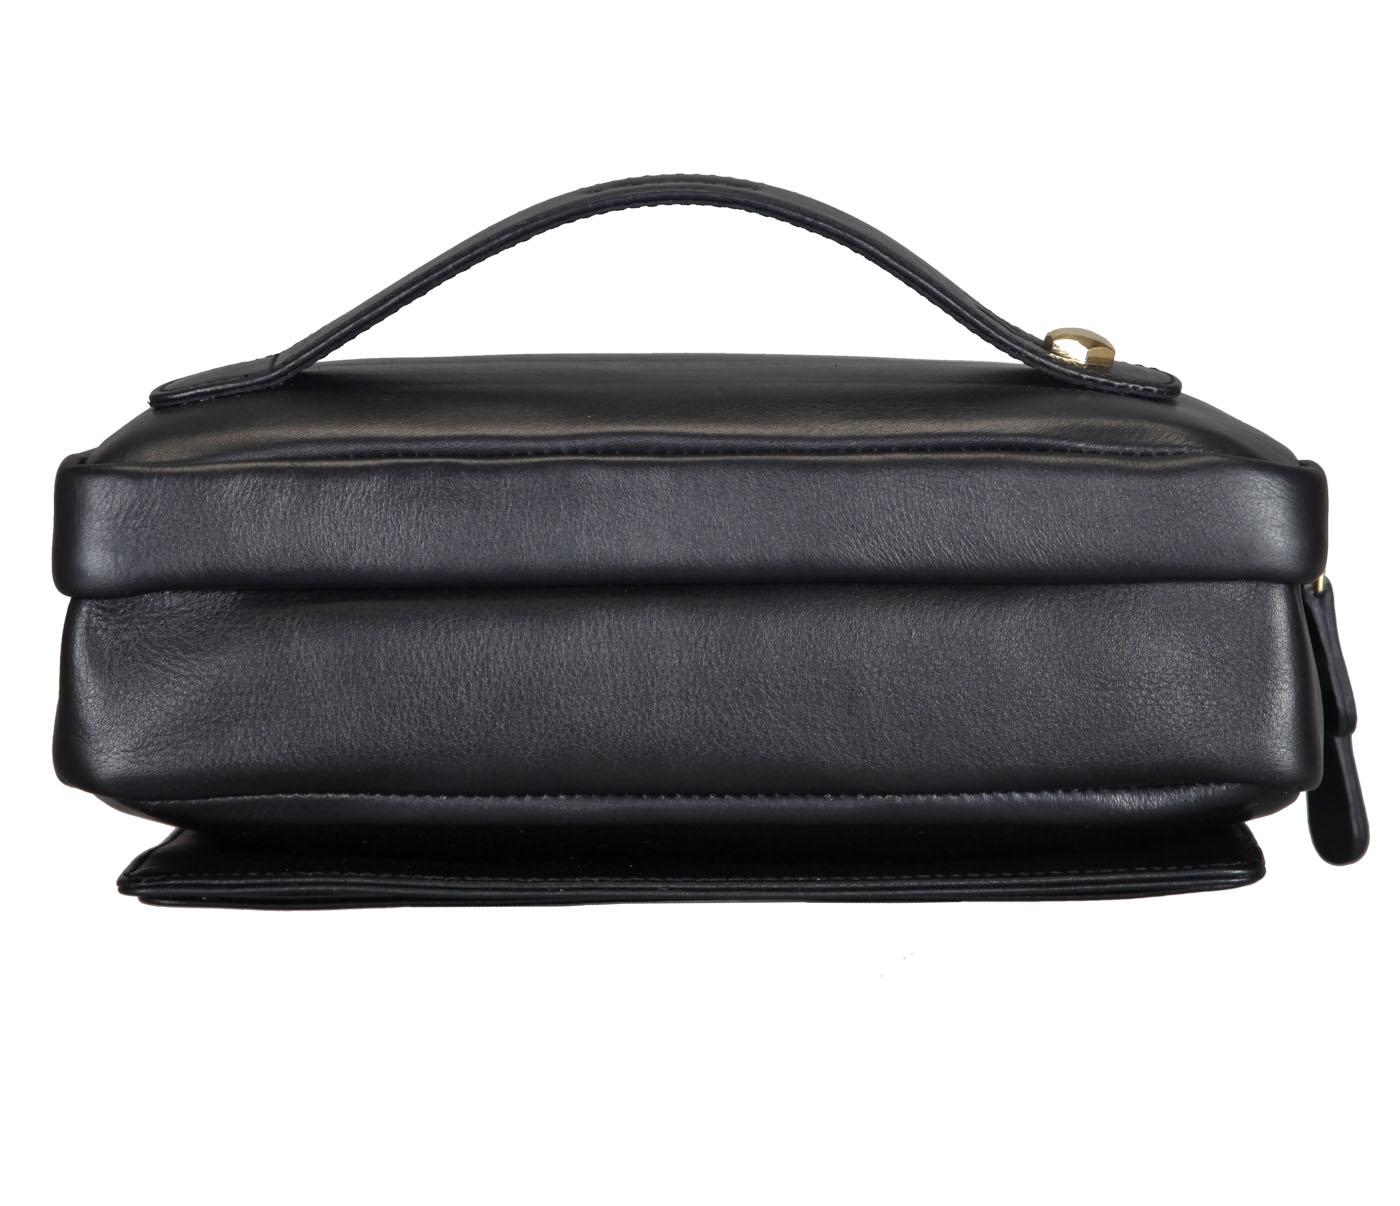 P32-Jesse-Men's bag cum travel pouch in Genuine Leather  - Black